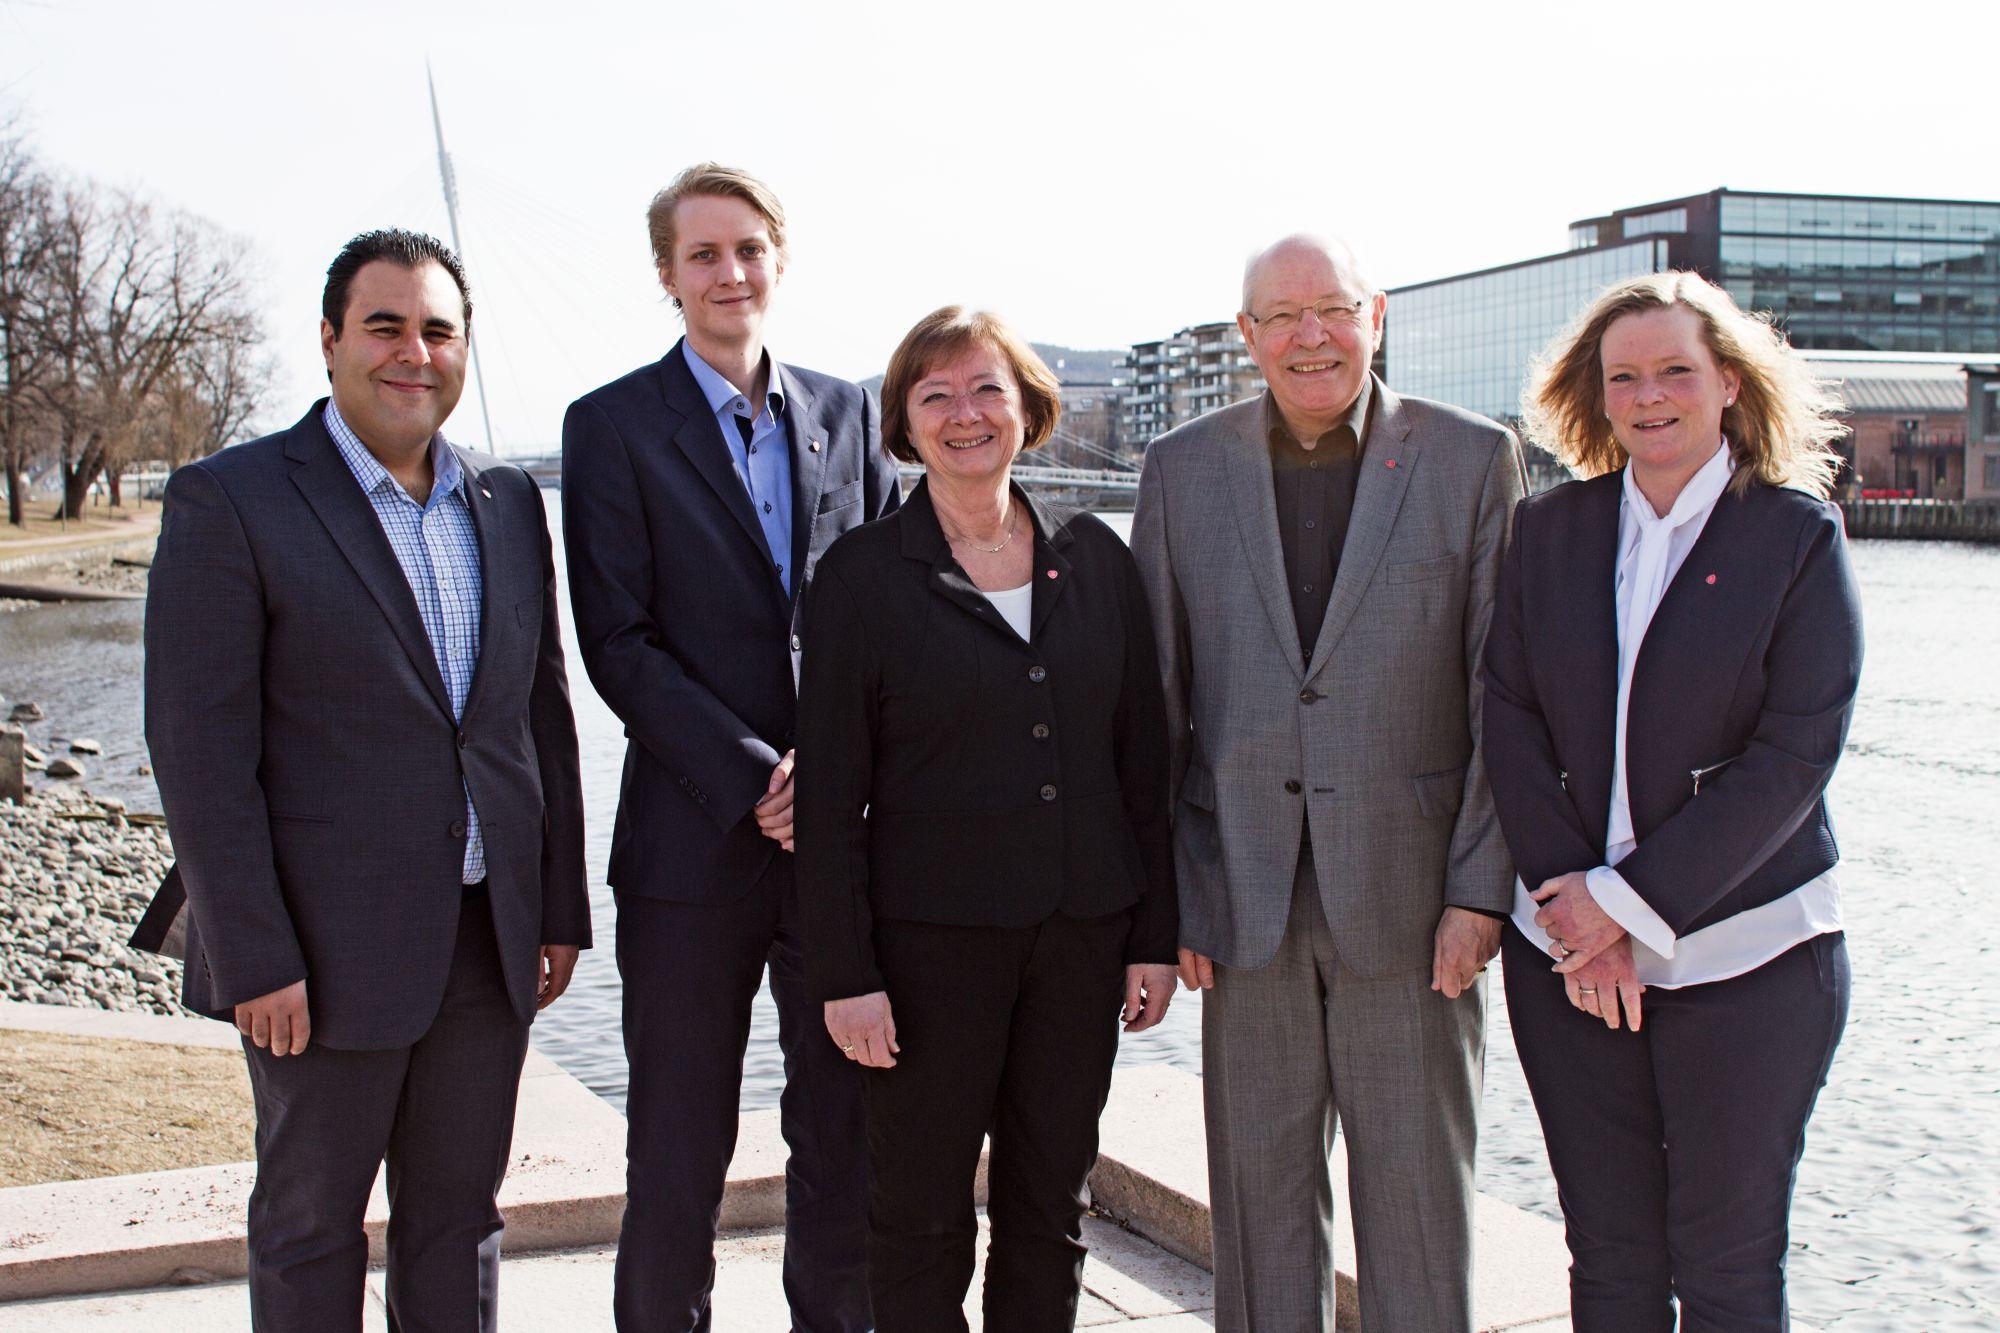 Masud Gharahkhani, Niclas Tokerud, Lise Christoffersen, Martin Kolberg, Anne Sandum.